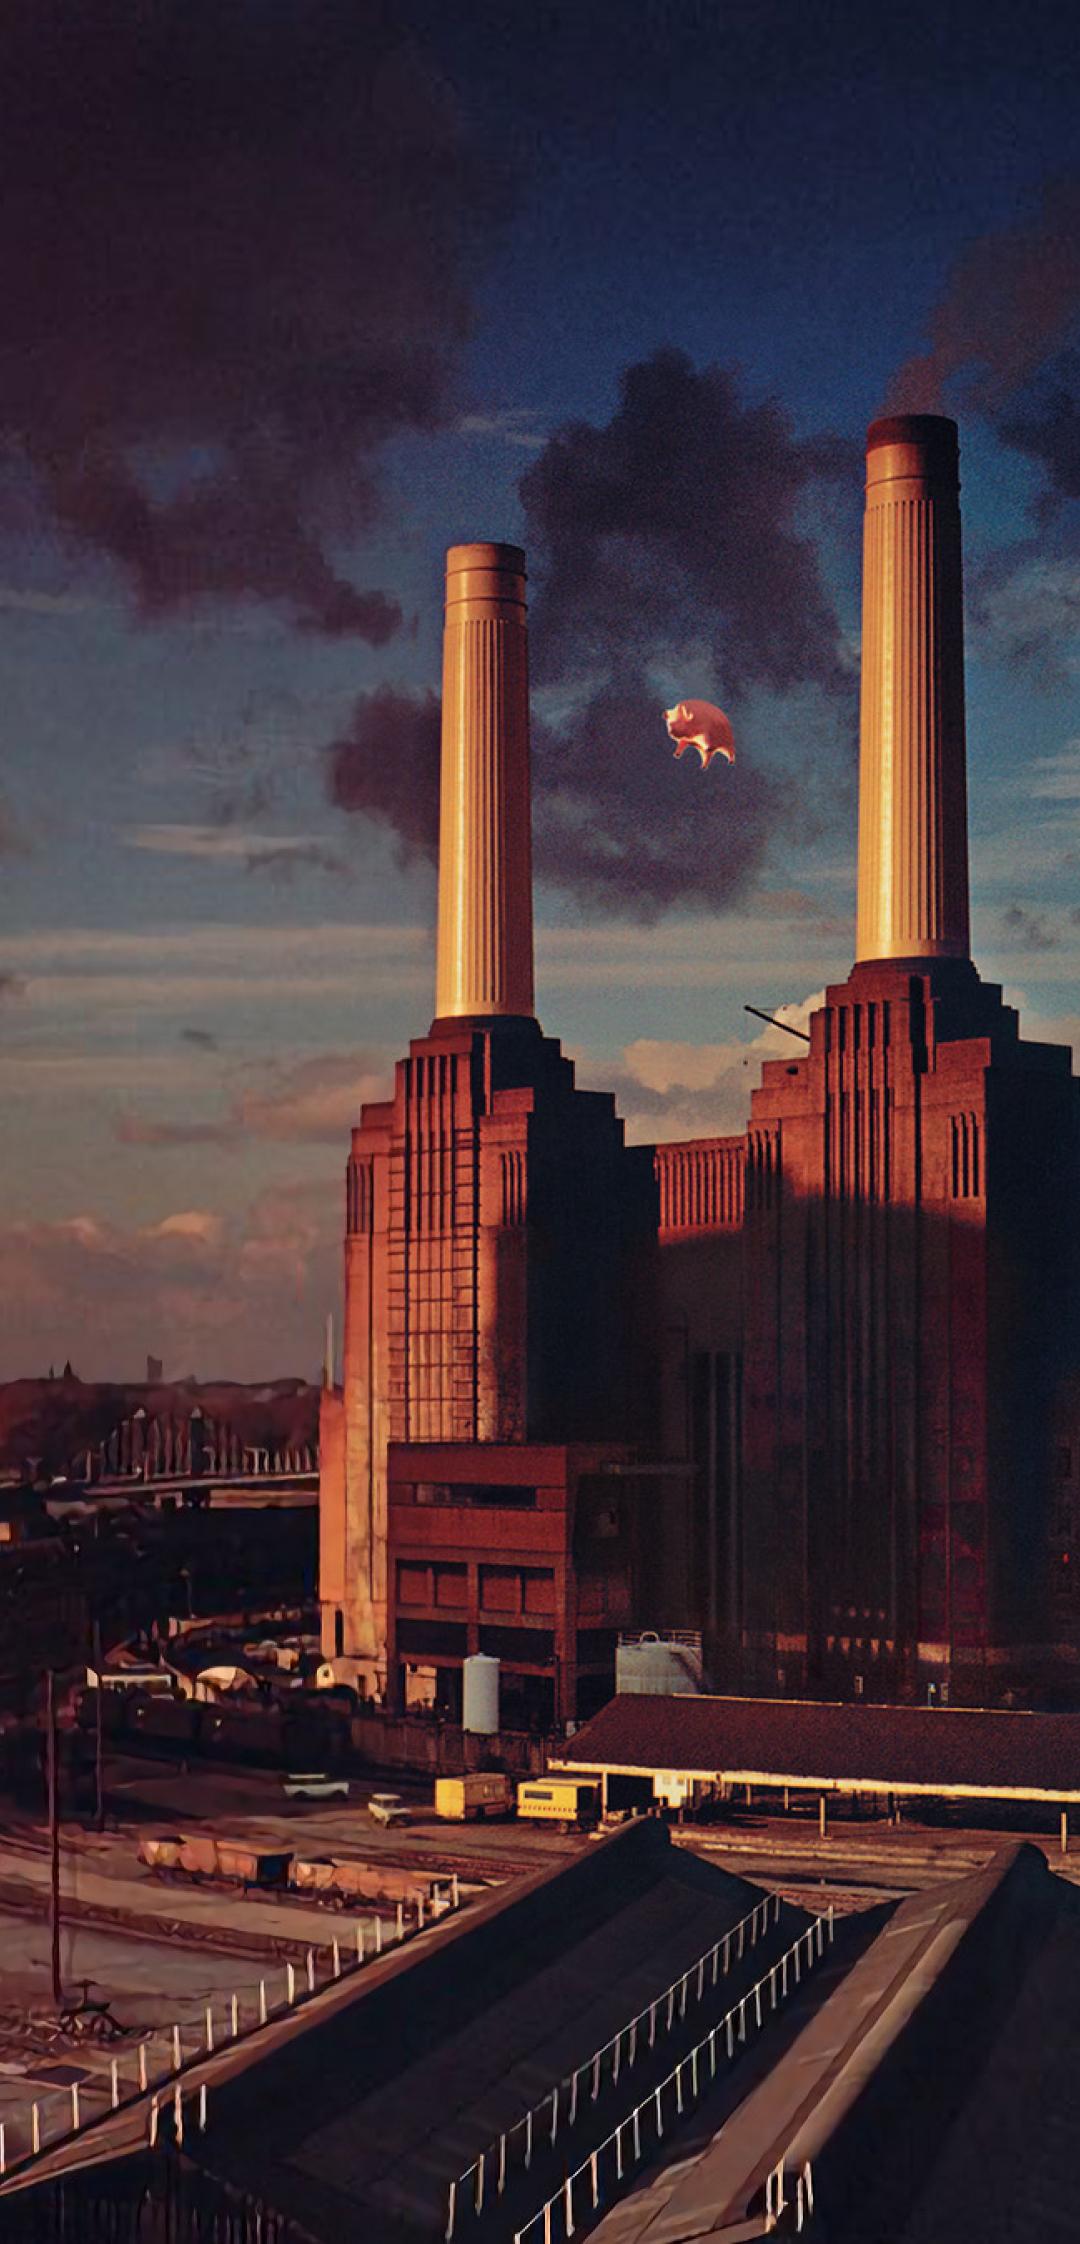 1080x2244 Pink Floyd Animals Album Cover 1080x2244 ...